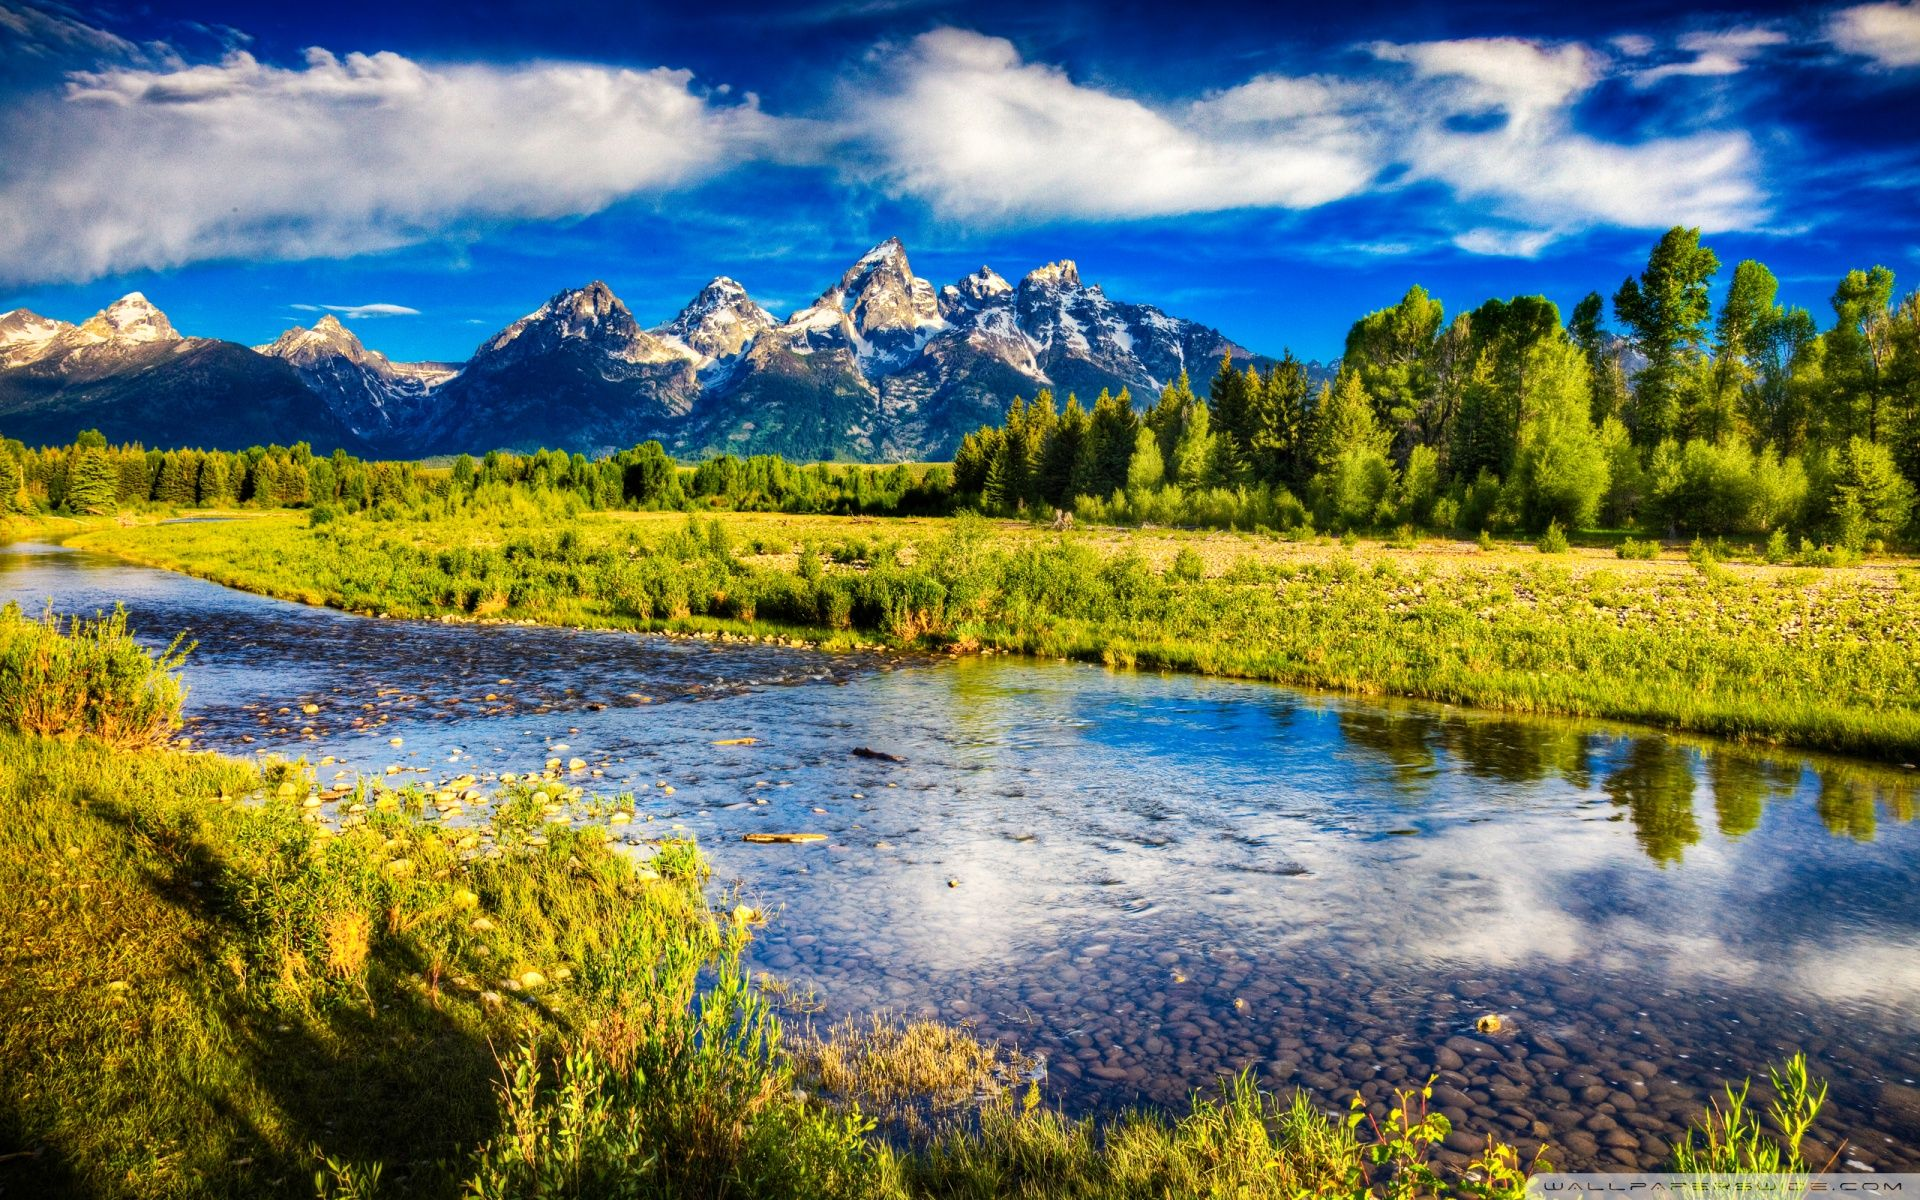 Beautiful Mountain Scenery Wallpaper Phone : Nature ...